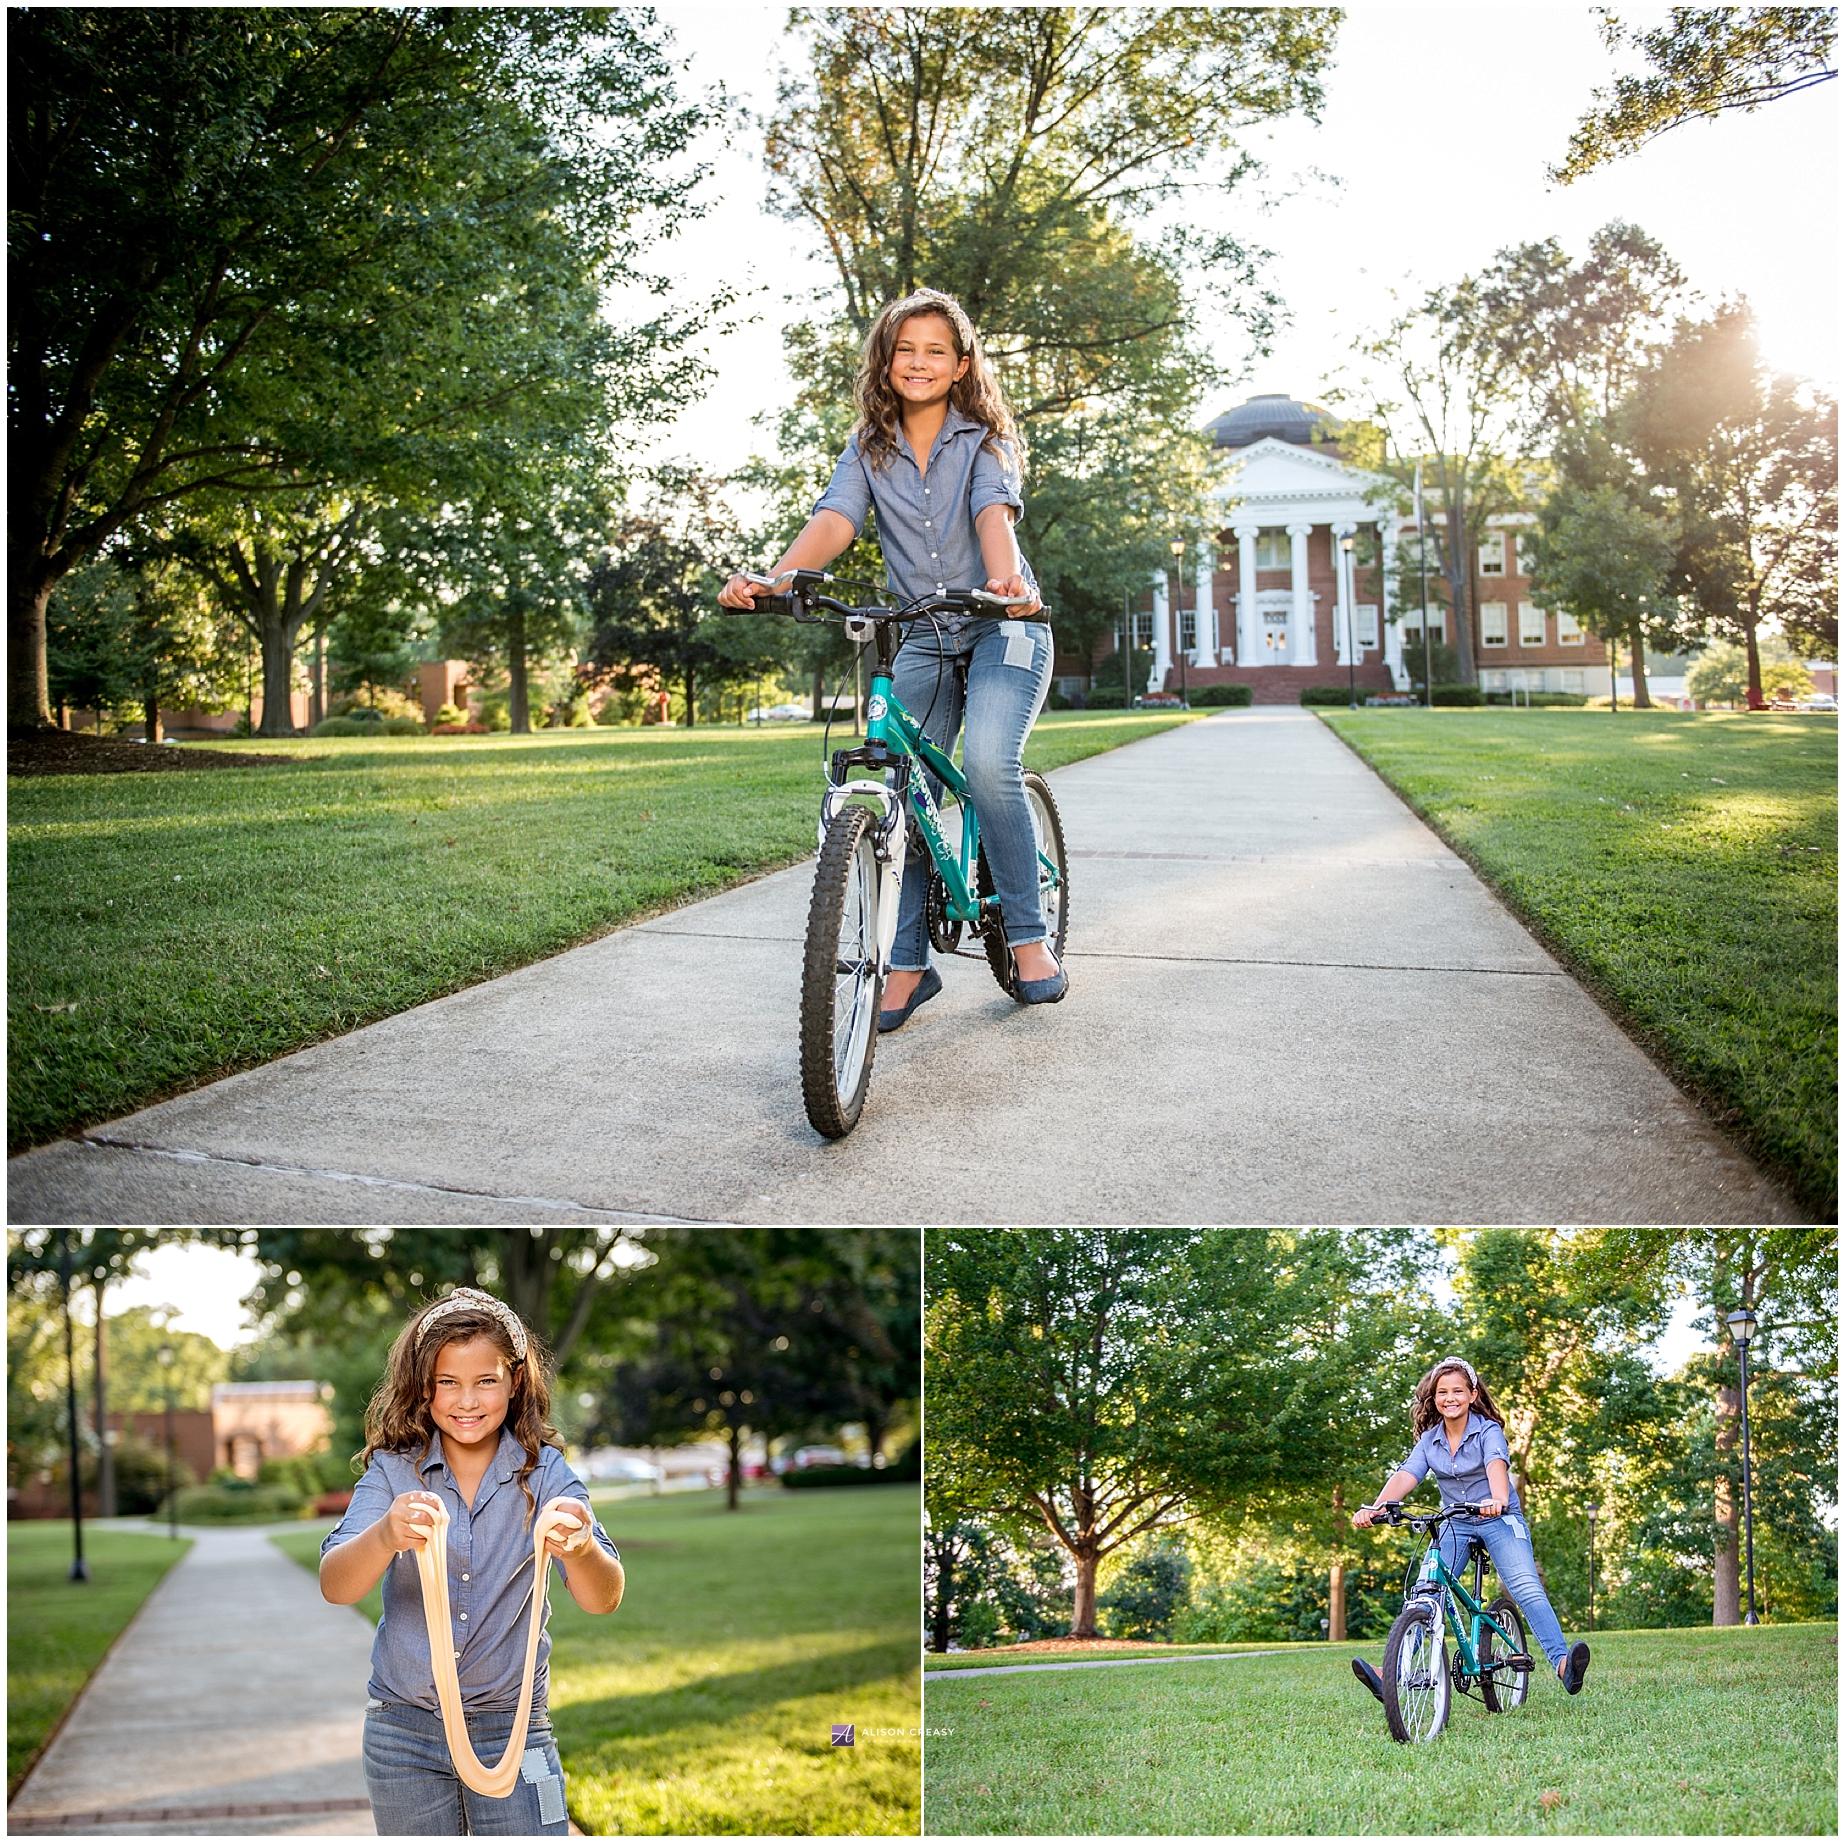 Alison-Creasy-Photography-Lynchburg-VA-Photographer_0907.jpg